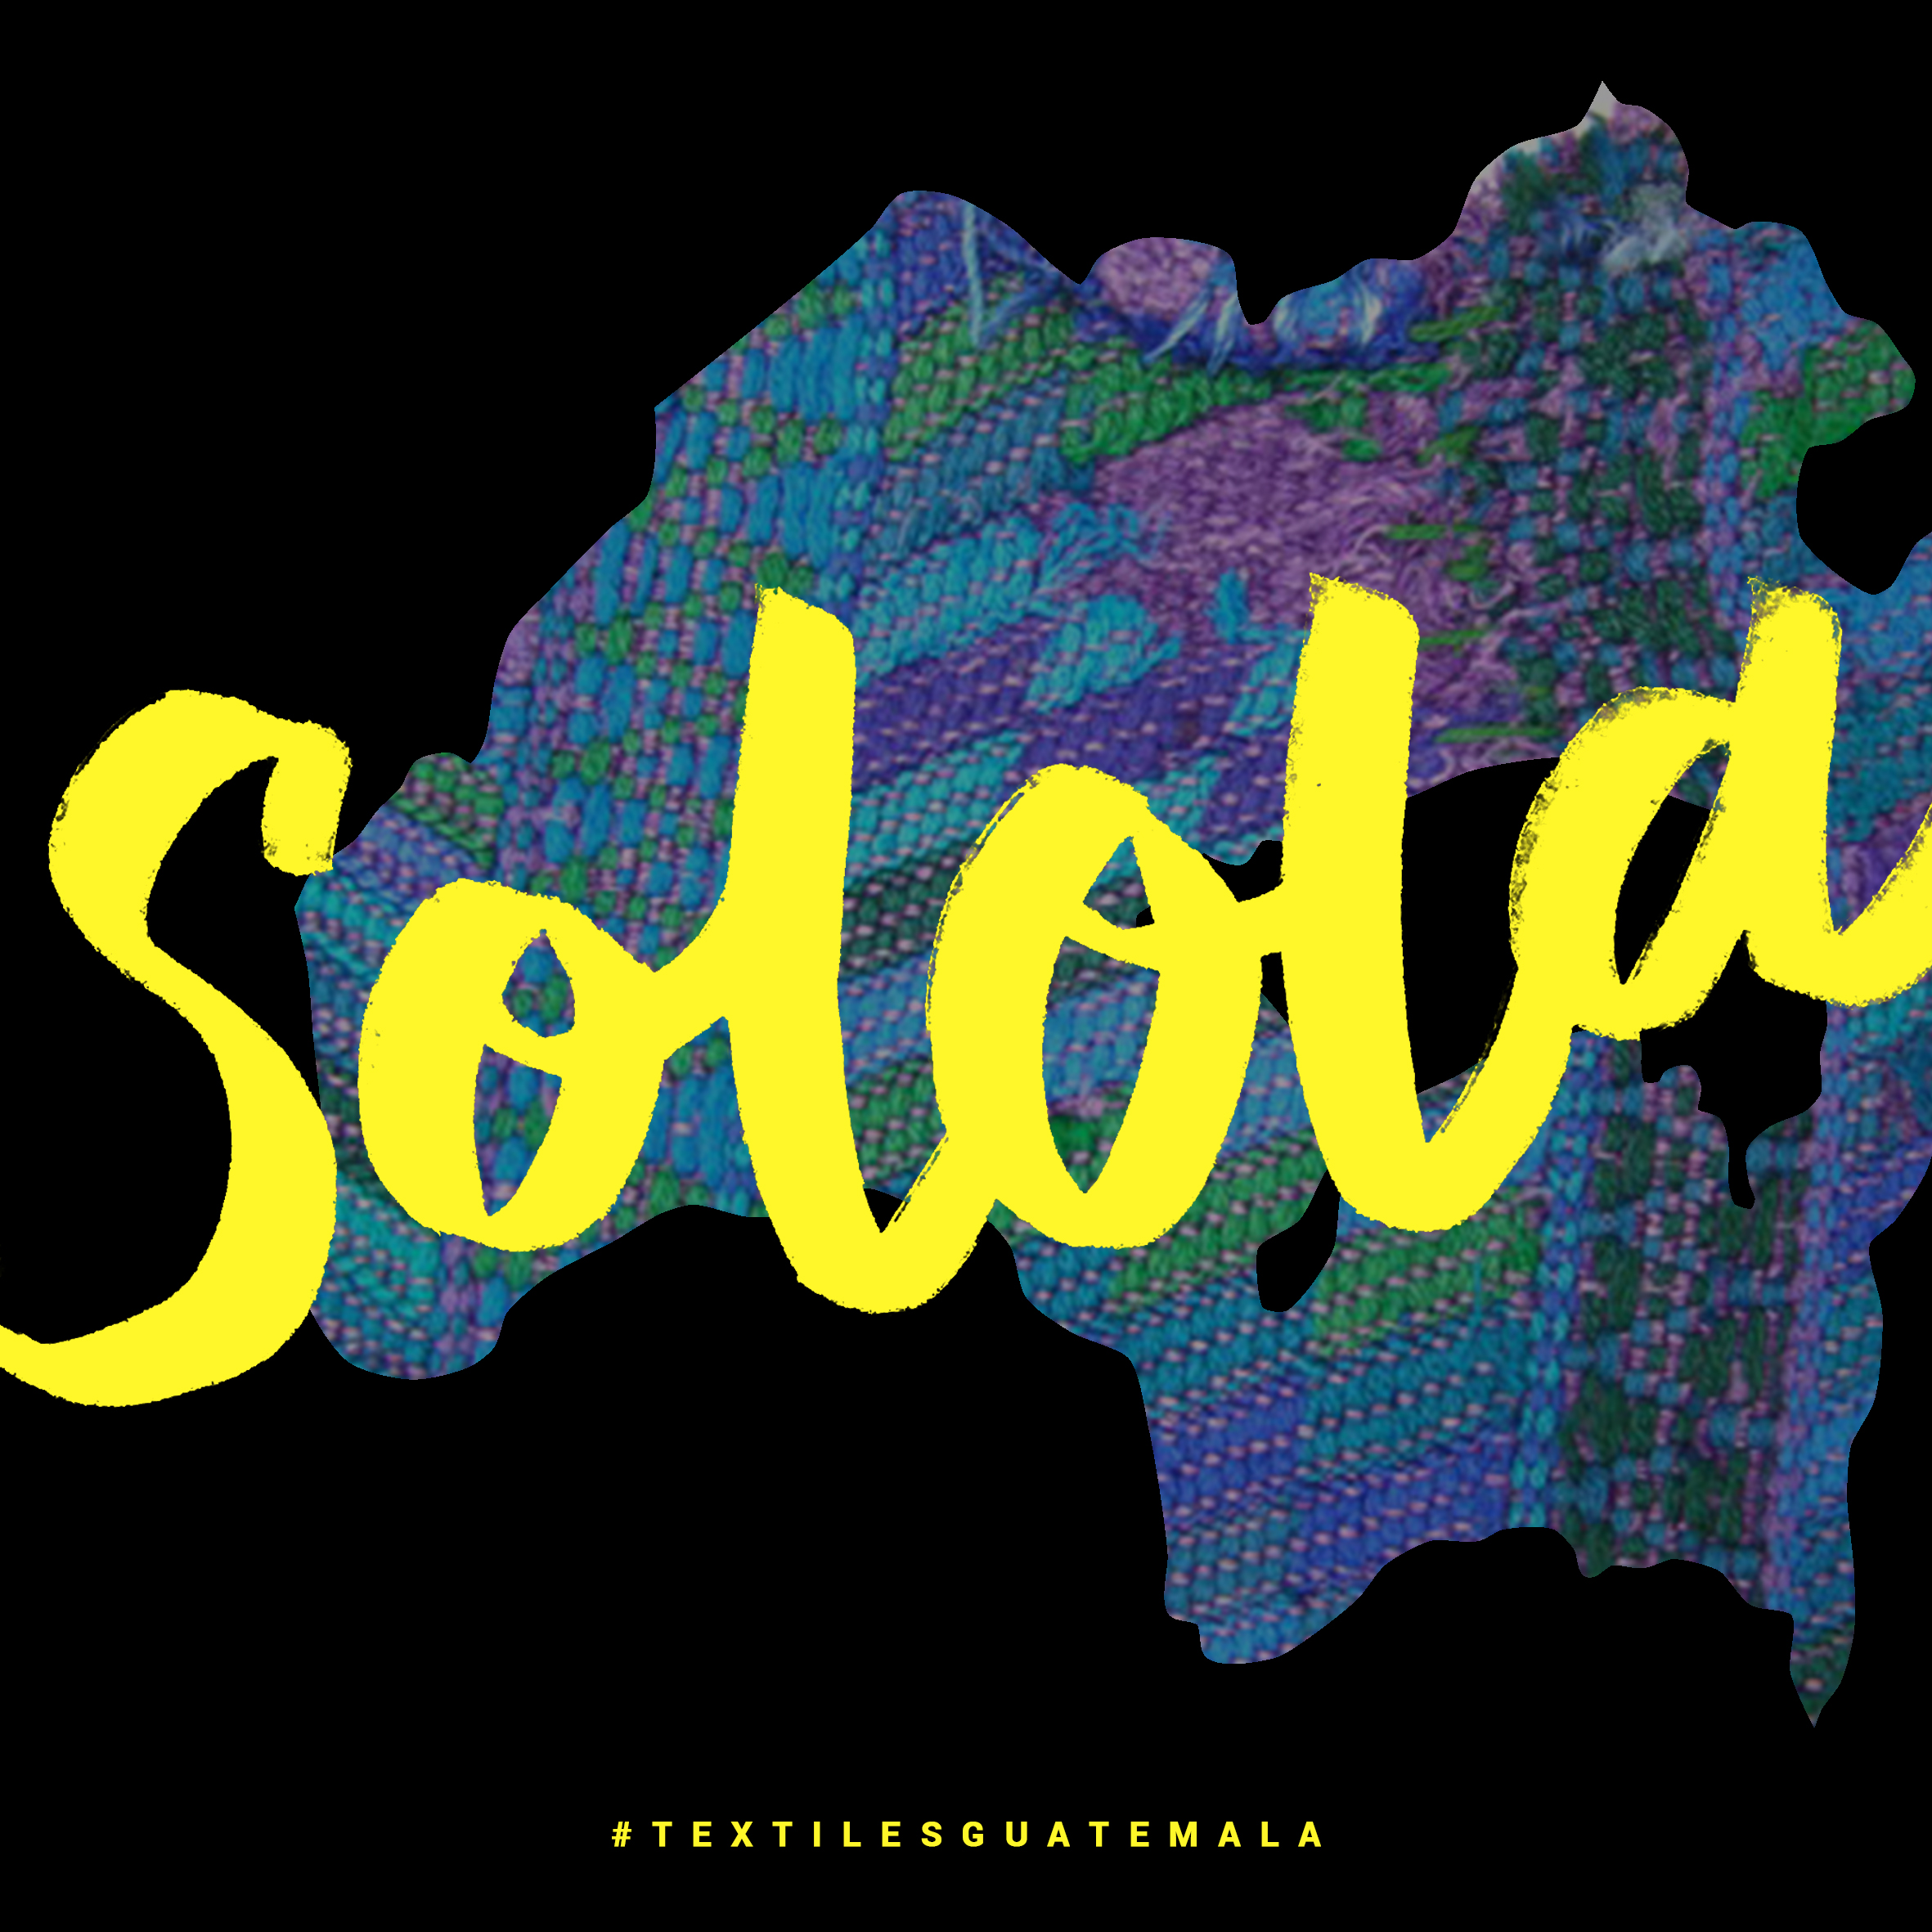 Solola.jpg